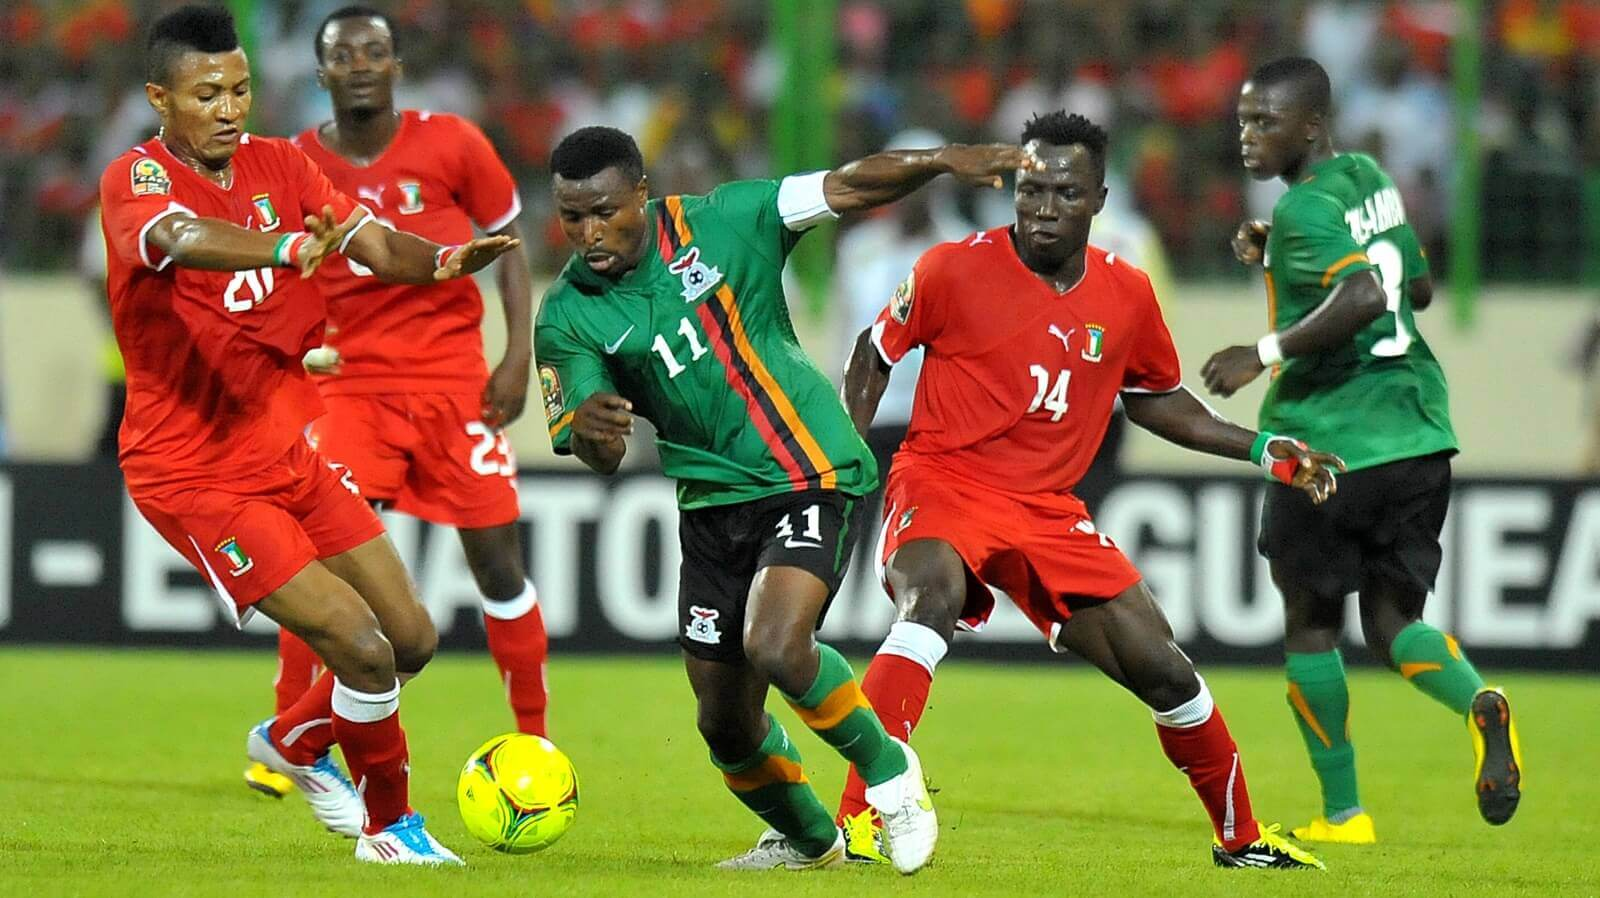 Sports betting in Equatorial Guinea